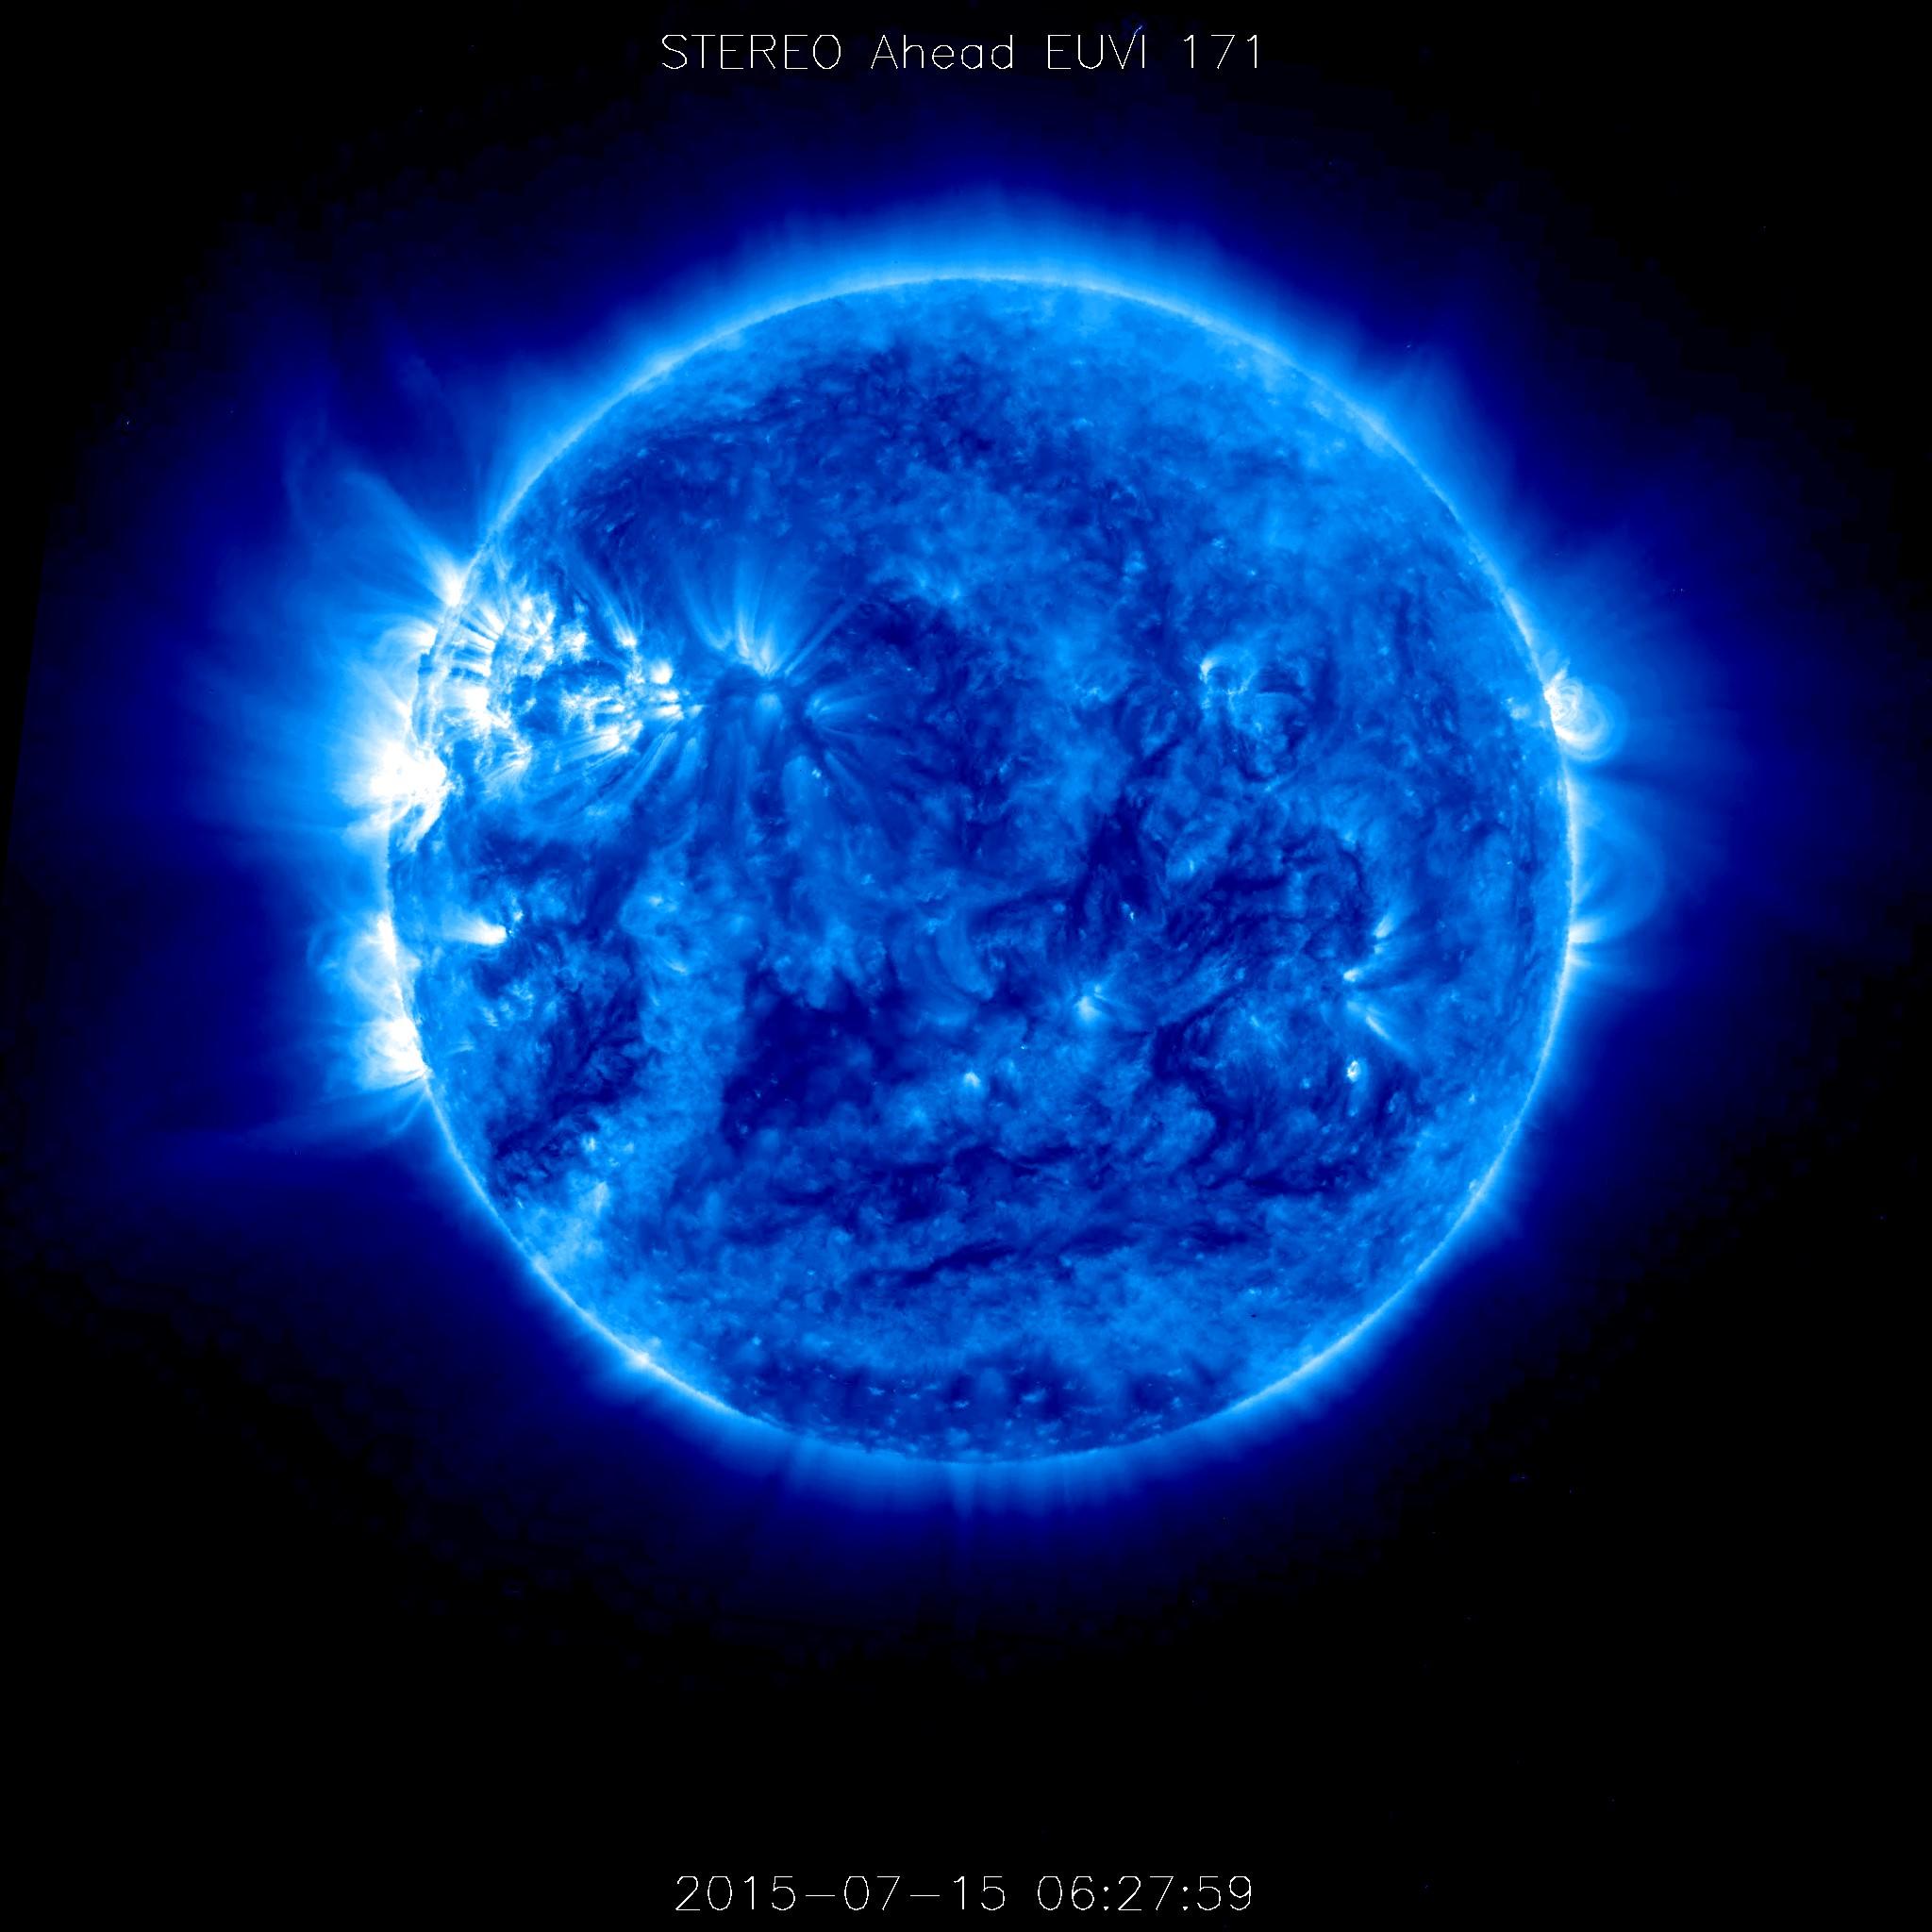 3 day solar storm june 11 2019 - photo #19